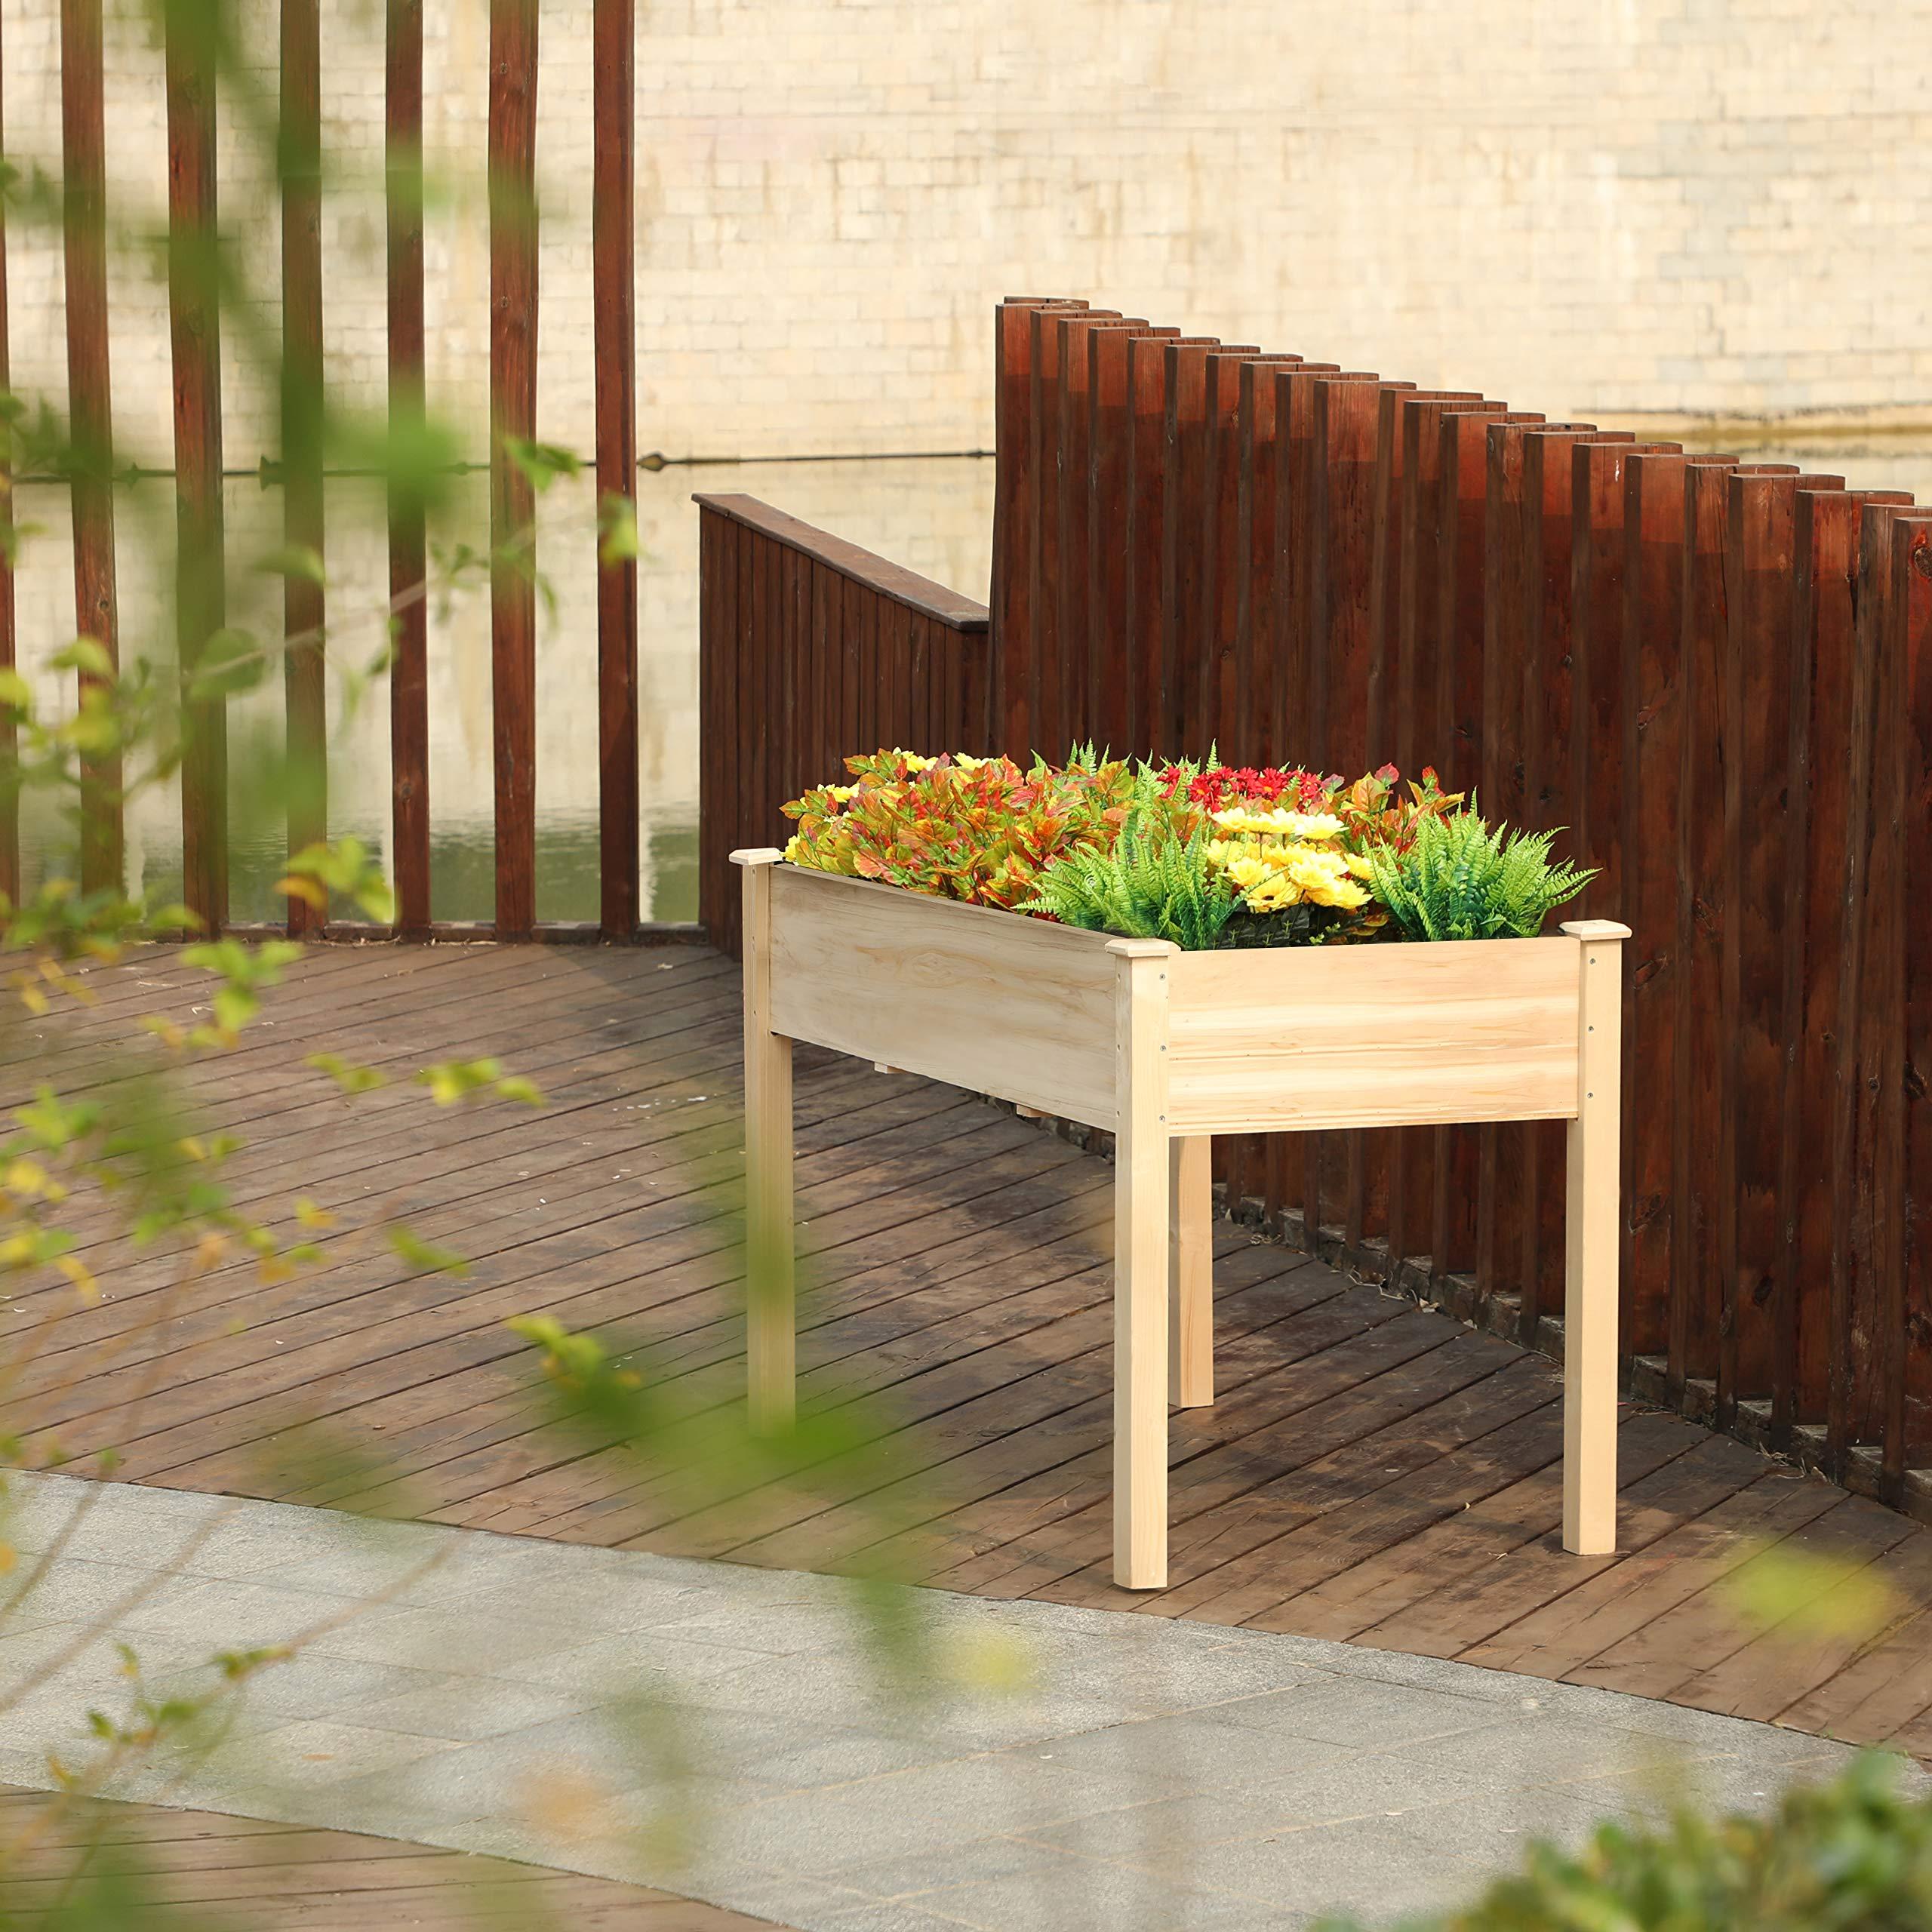 PHI VILLA Raised Garden Bed Elevated Planter Box for Vegetable/Flower/Fruit/Herb (48''x30''x22.5'')